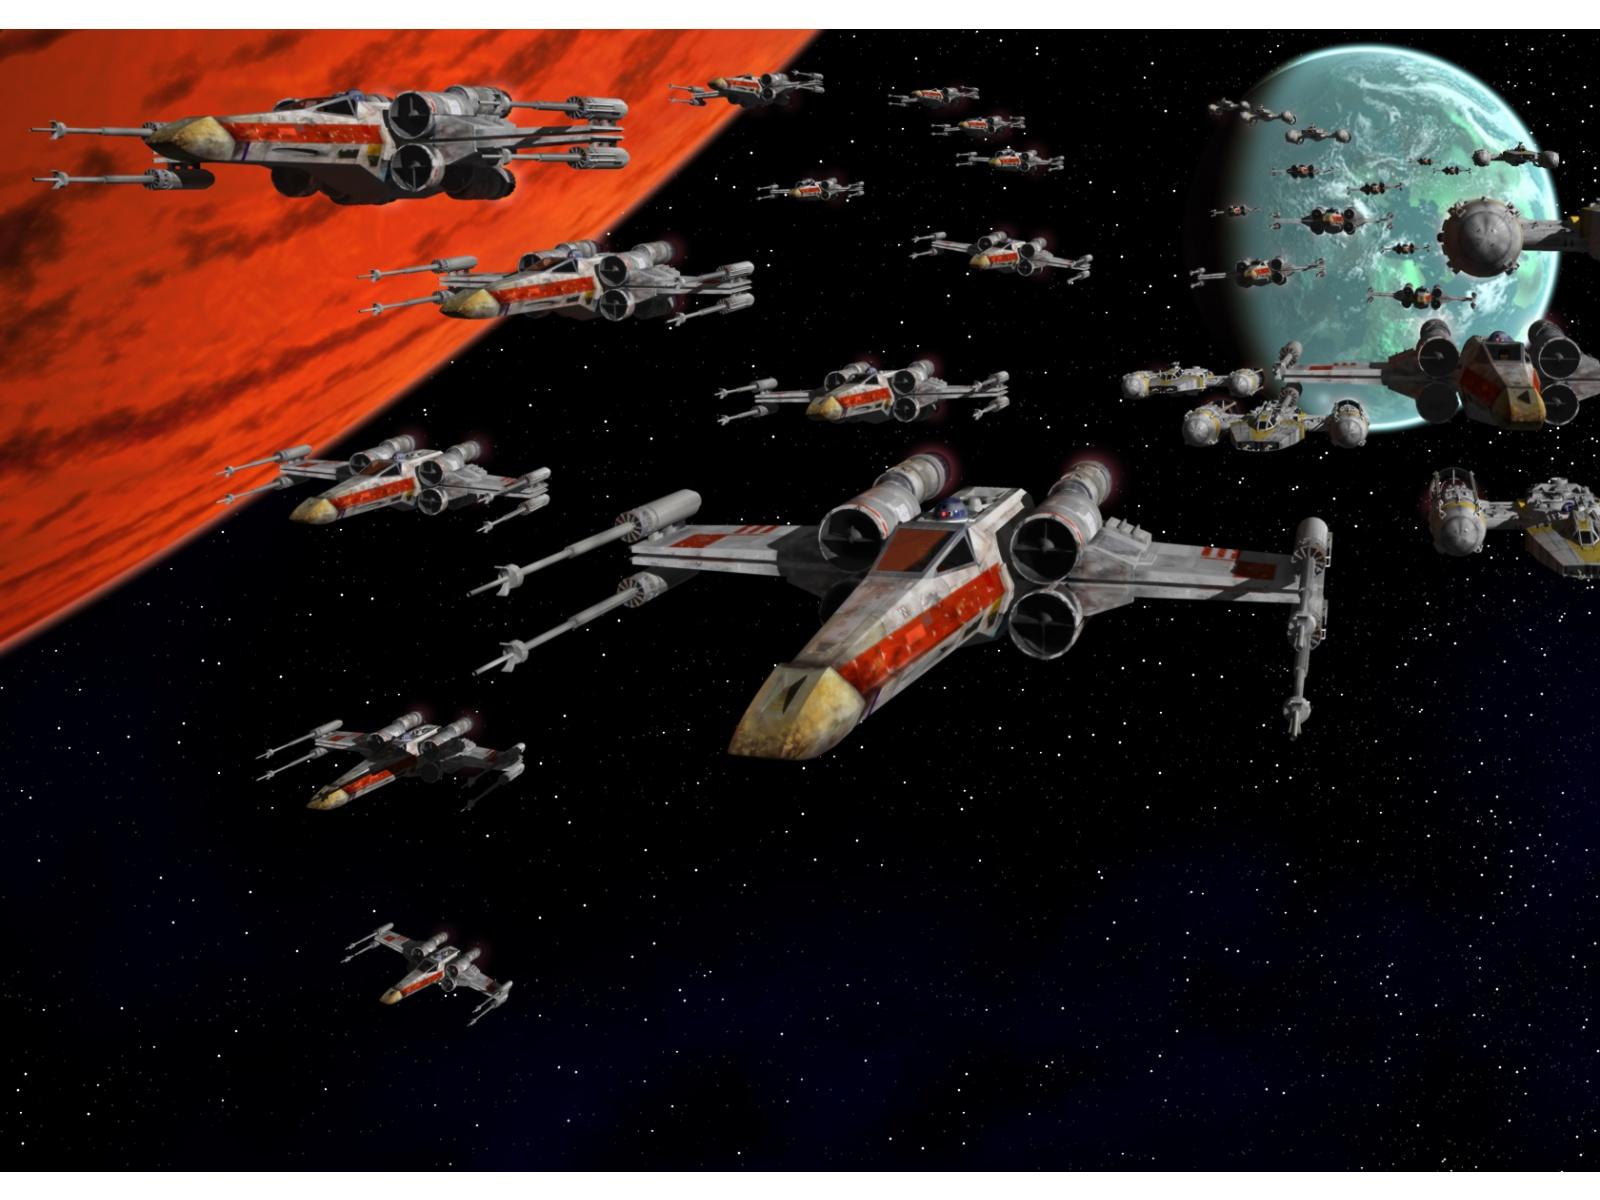 star wars x wing desktop wallpaper 1600x1200   Geek Vox 1600x1200